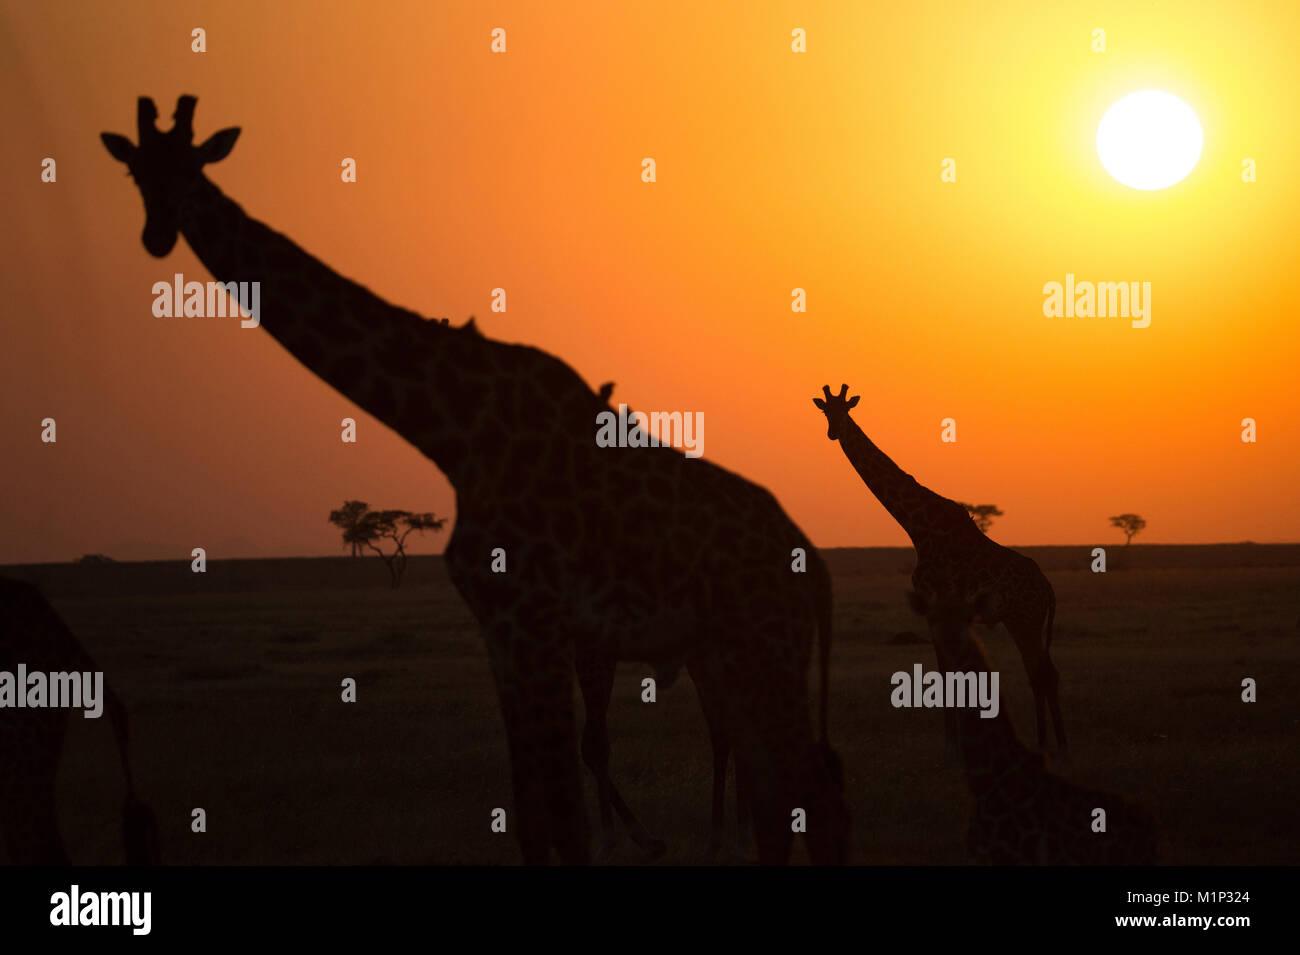 Silhouetten der Giraffe (Giraffa Camelopardalis) bei Sonnenuntergang, Serengeti National Park, Tansania, Ostafrika, Stockbild